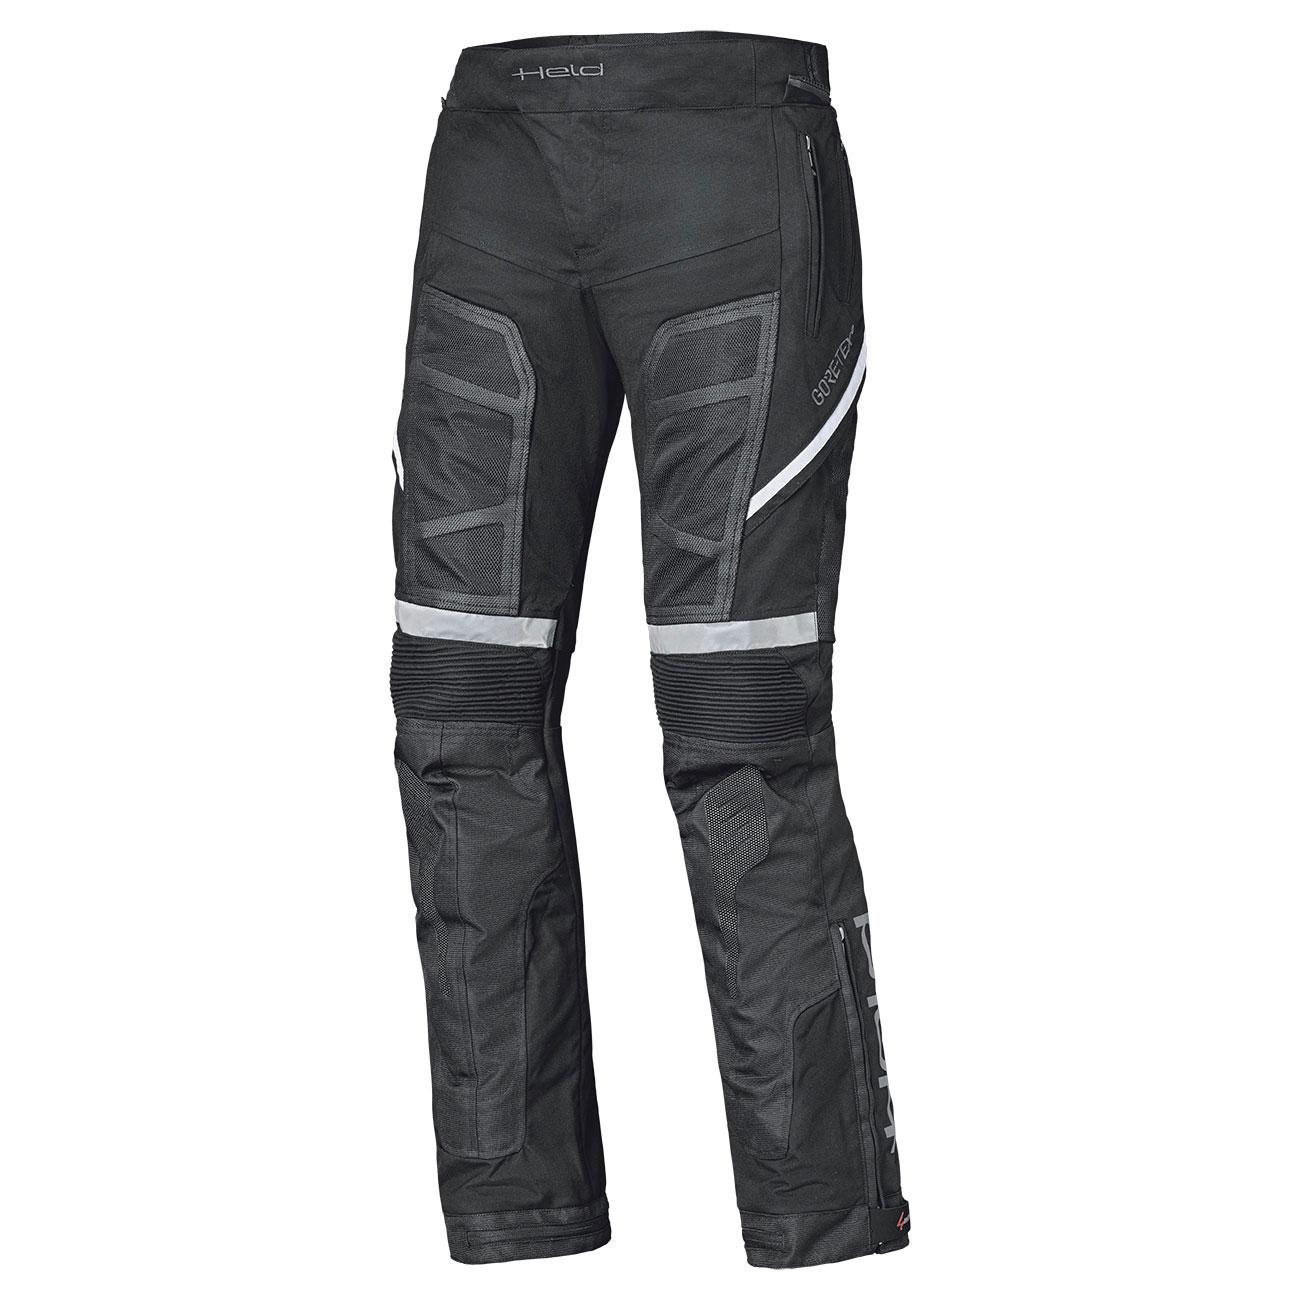 Pantaloni Held 2in1 Aerosec Gore-tex® Nero Bianco